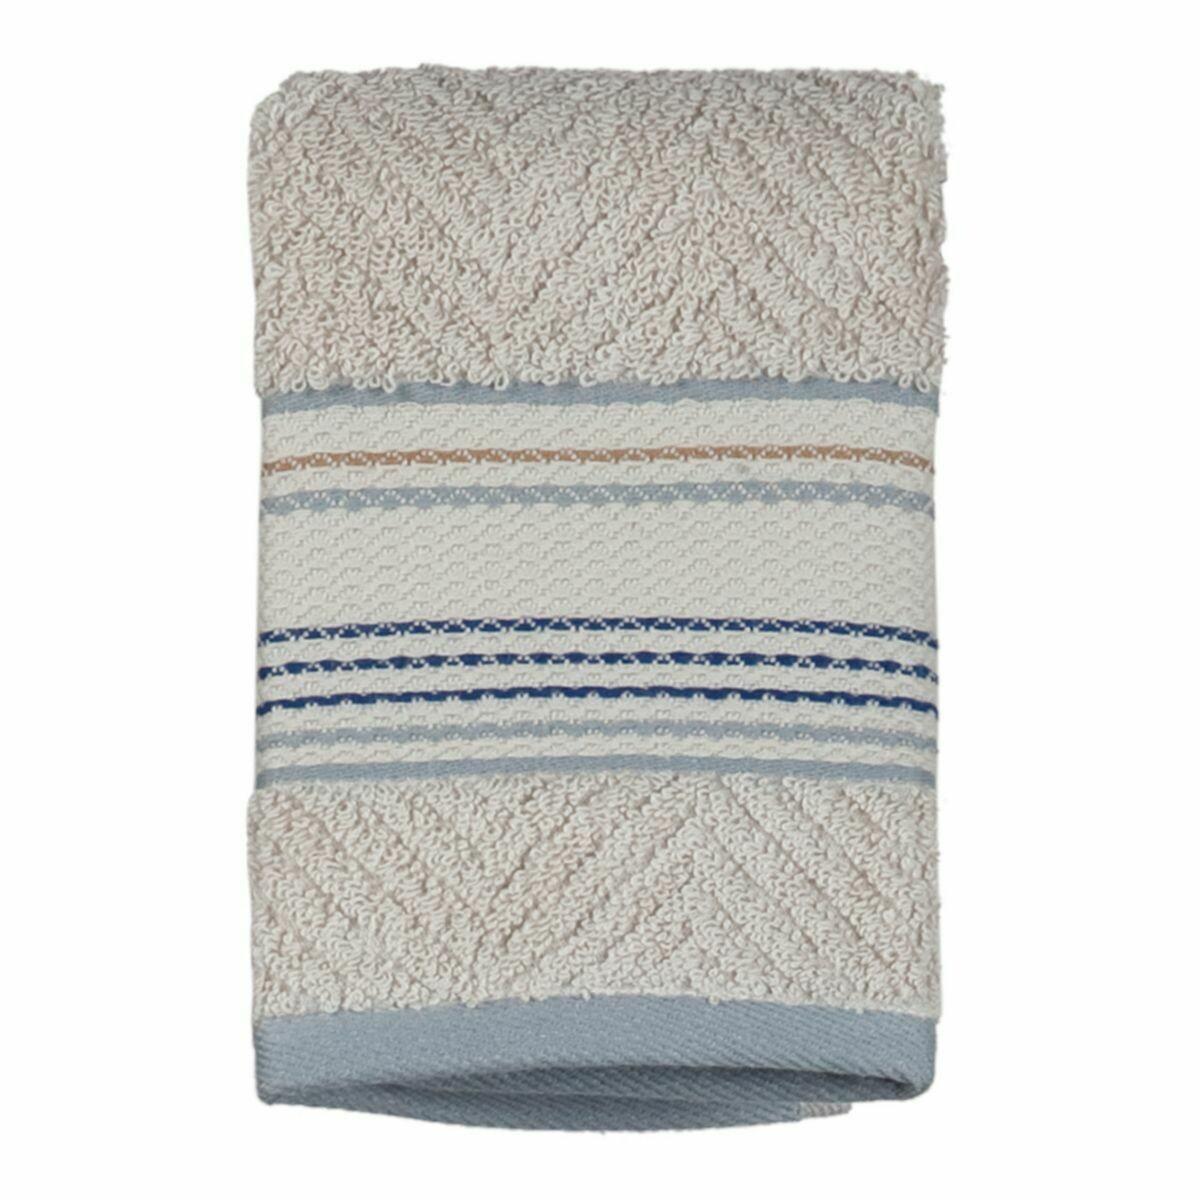 Ticking Stripe Hand Towel